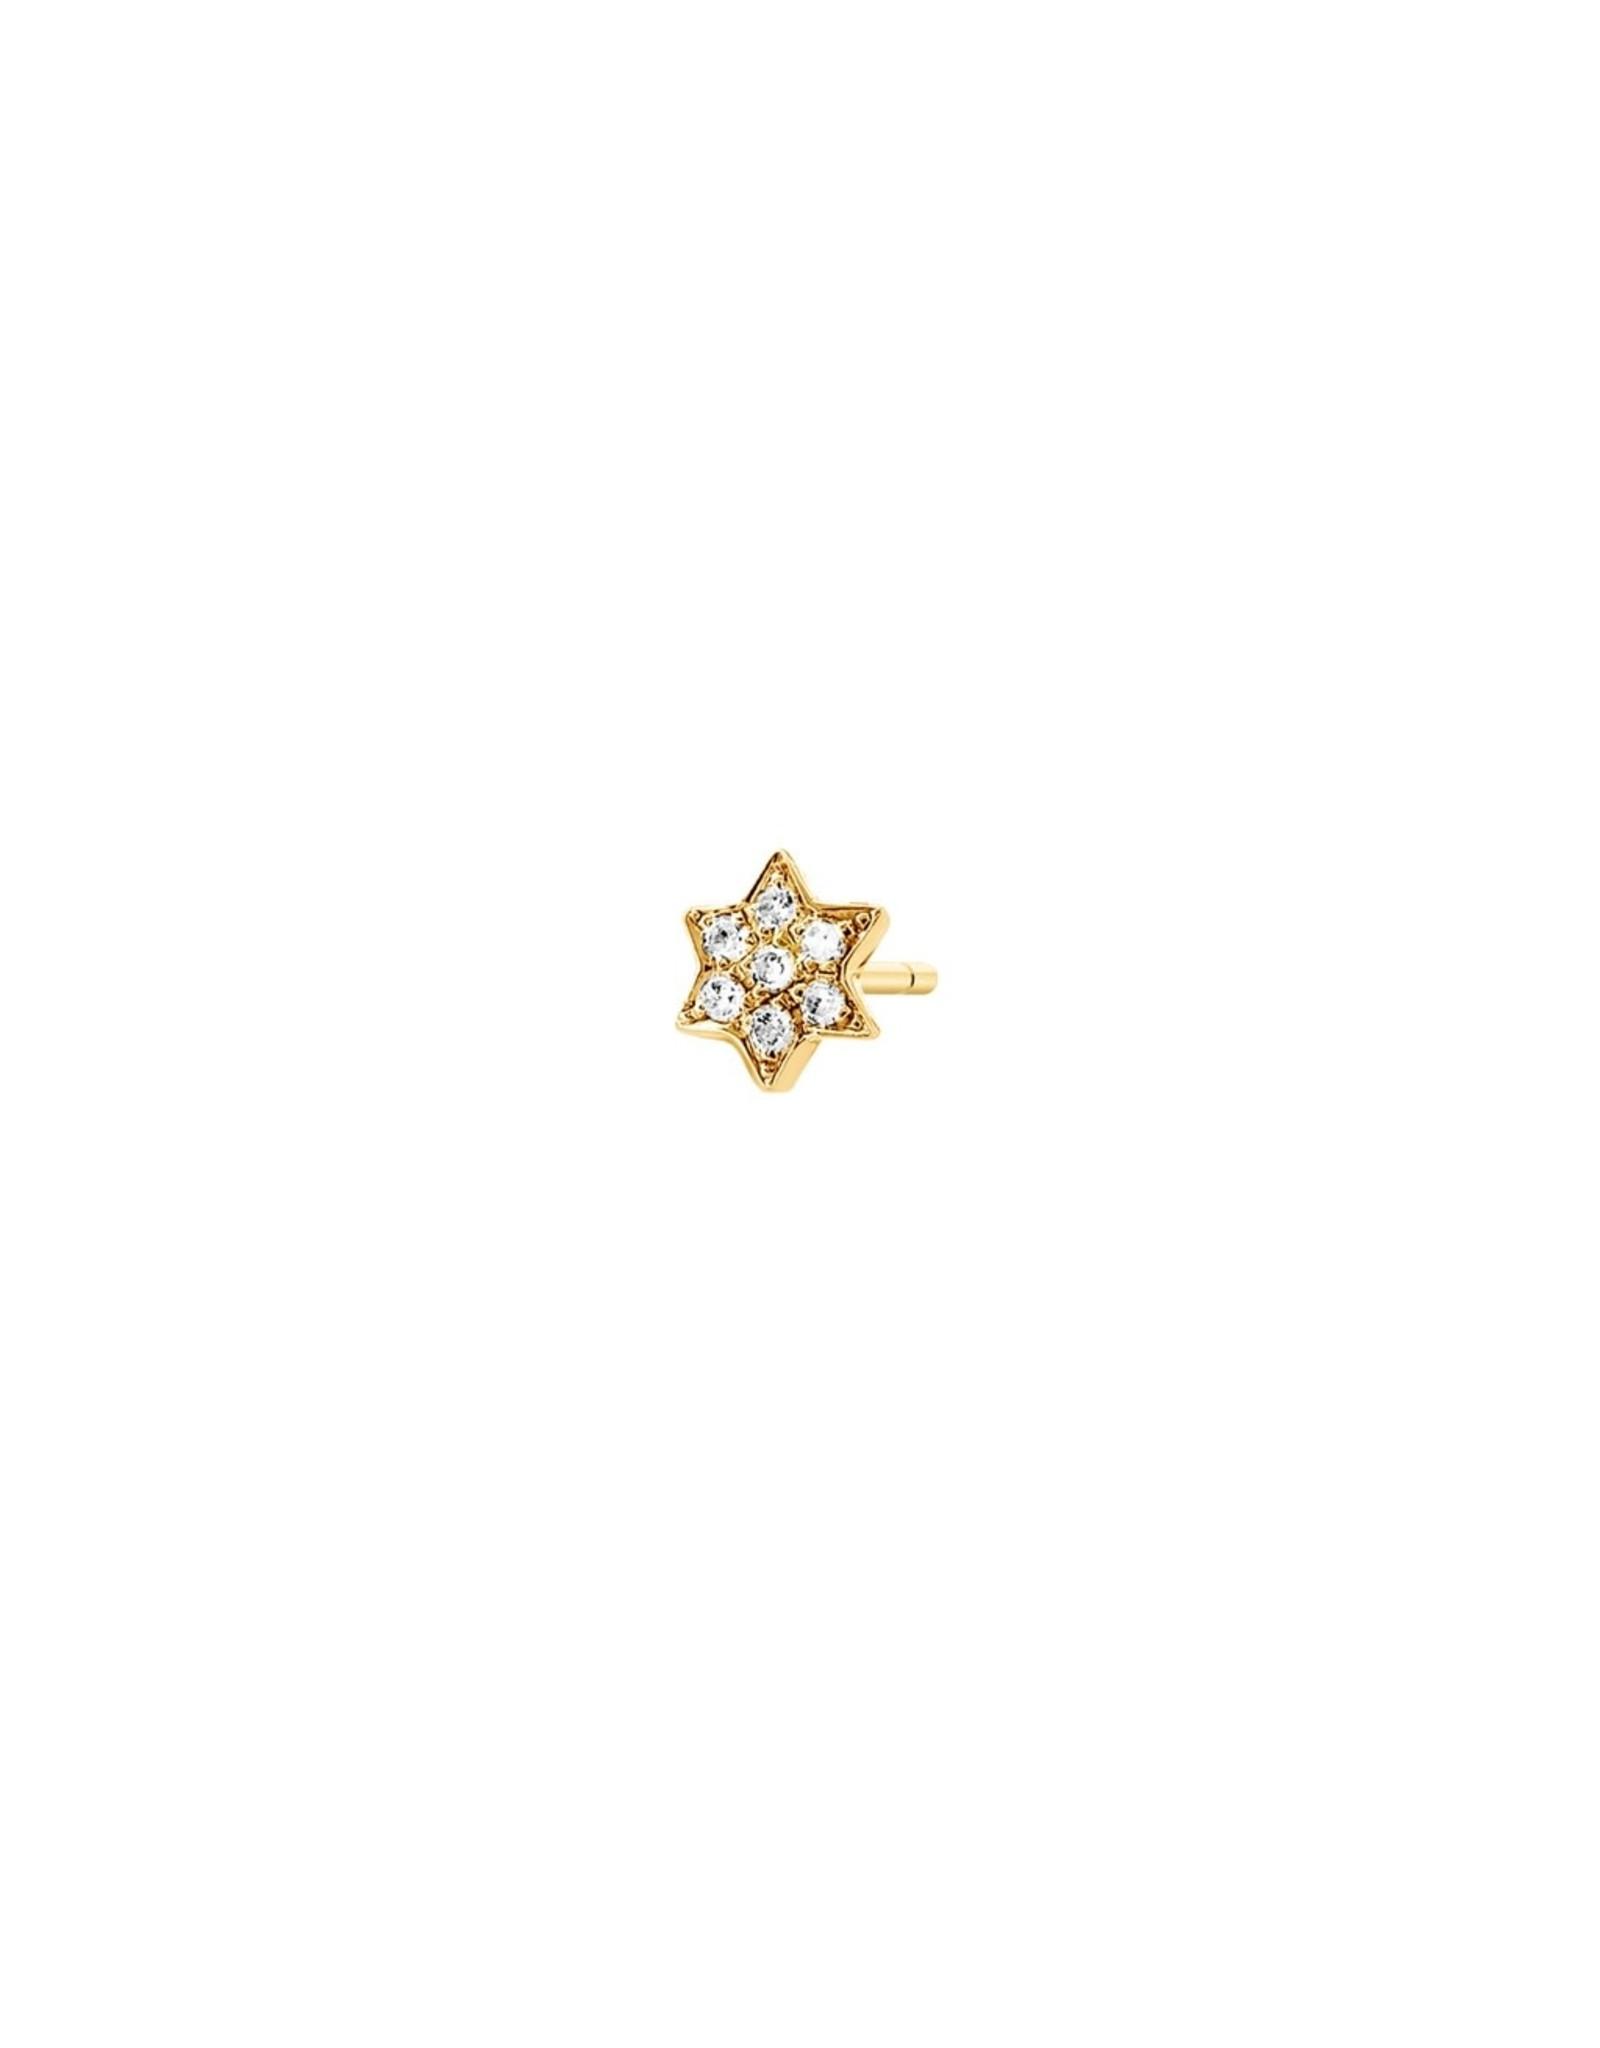 Diamanti Per Tutti Star Earring (Single) - Zilver Goudkleurig Briljant